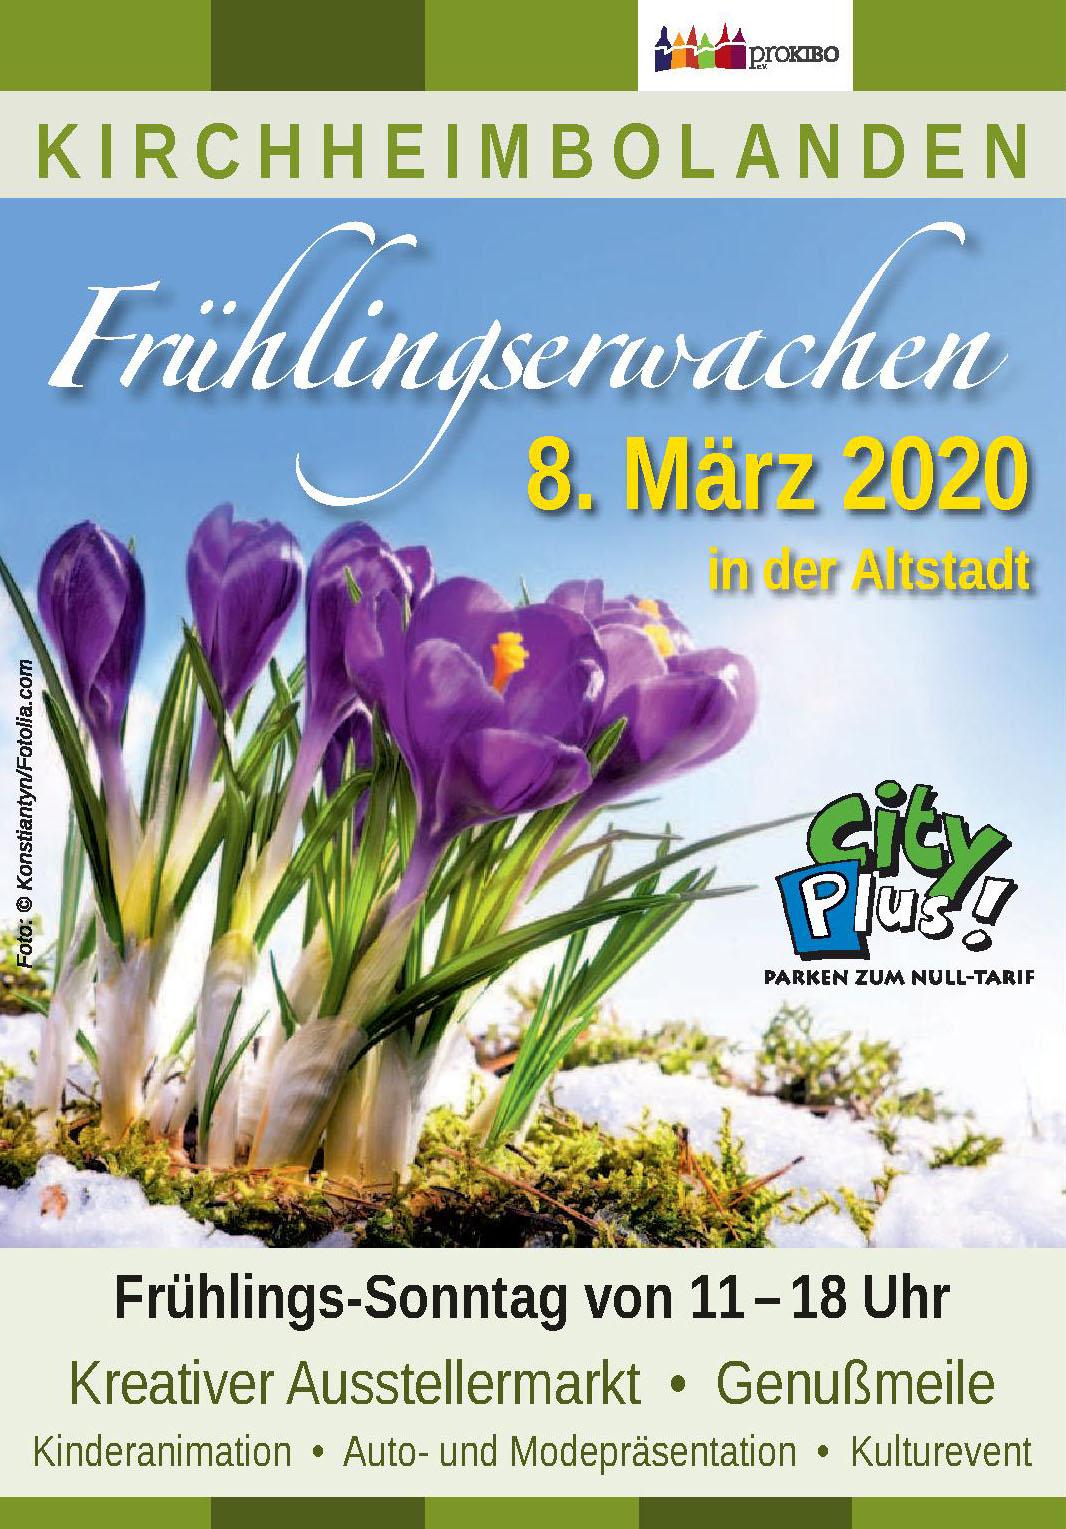 Kirchheimbolanden Frühlingemwachen